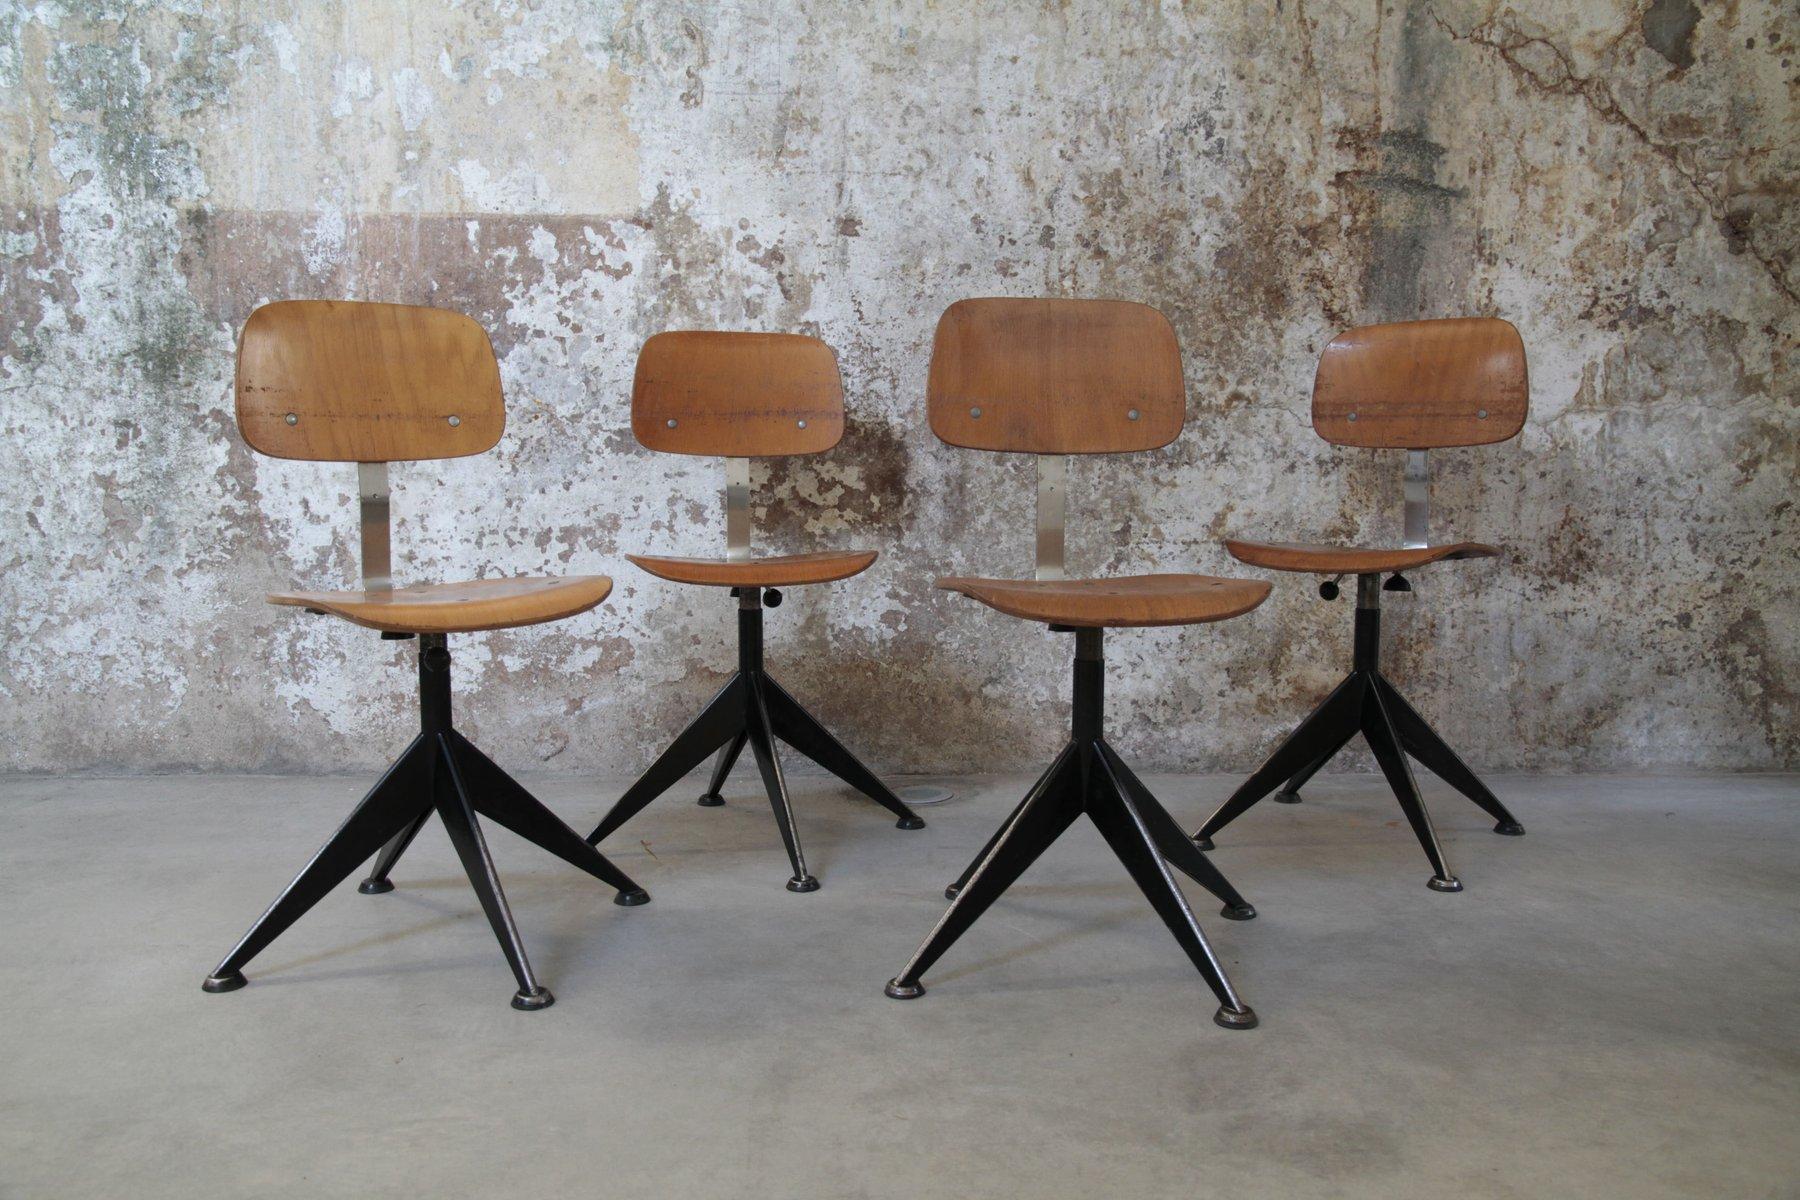 vintage holzst hle von velca legnano 4er set bei pamono kaufen. Black Bedroom Furniture Sets. Home Design Ideas